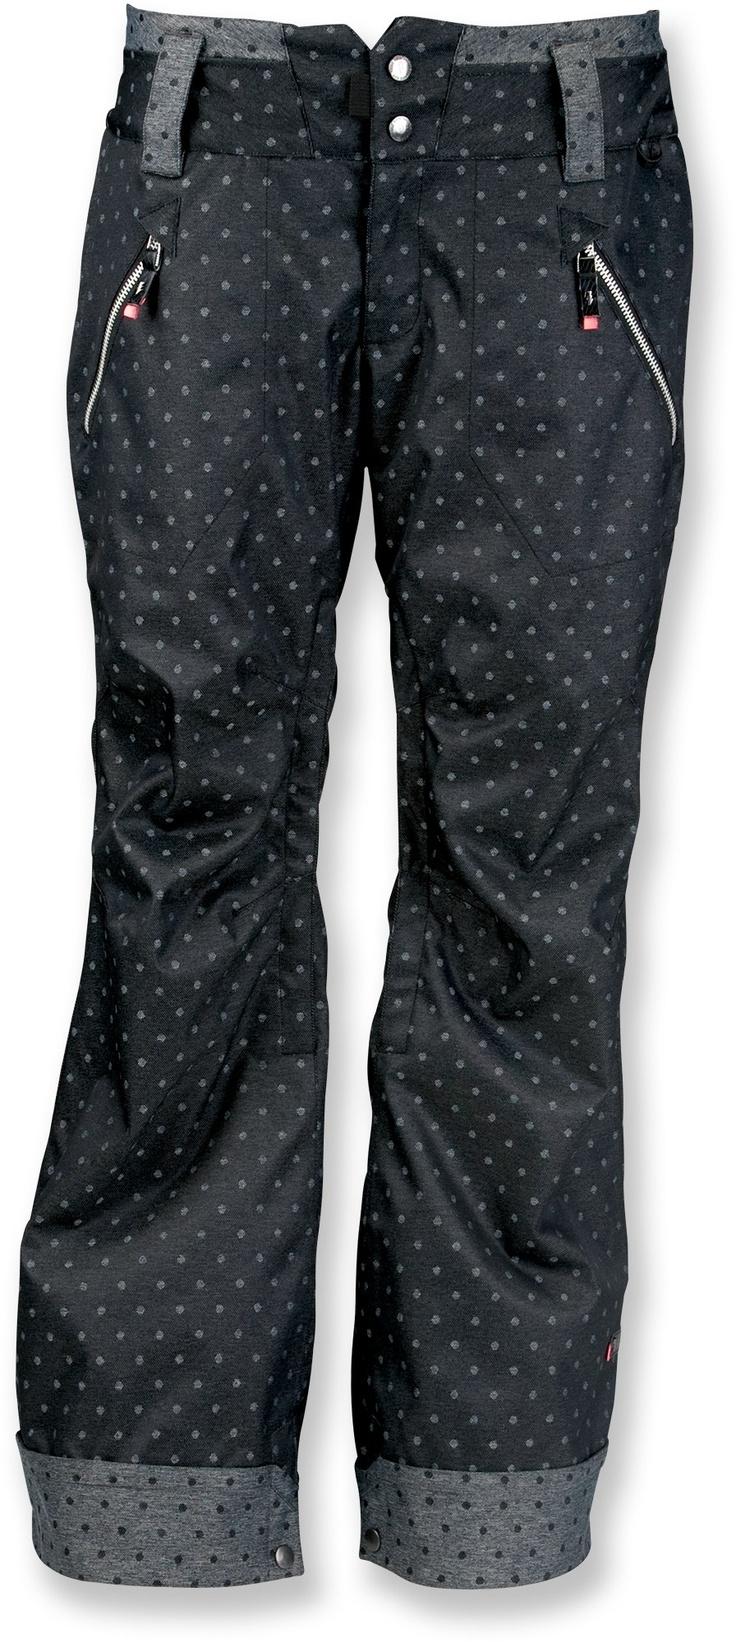 Ride Leschi Pants - Women's - 2011 Closeout with boa window cut out!